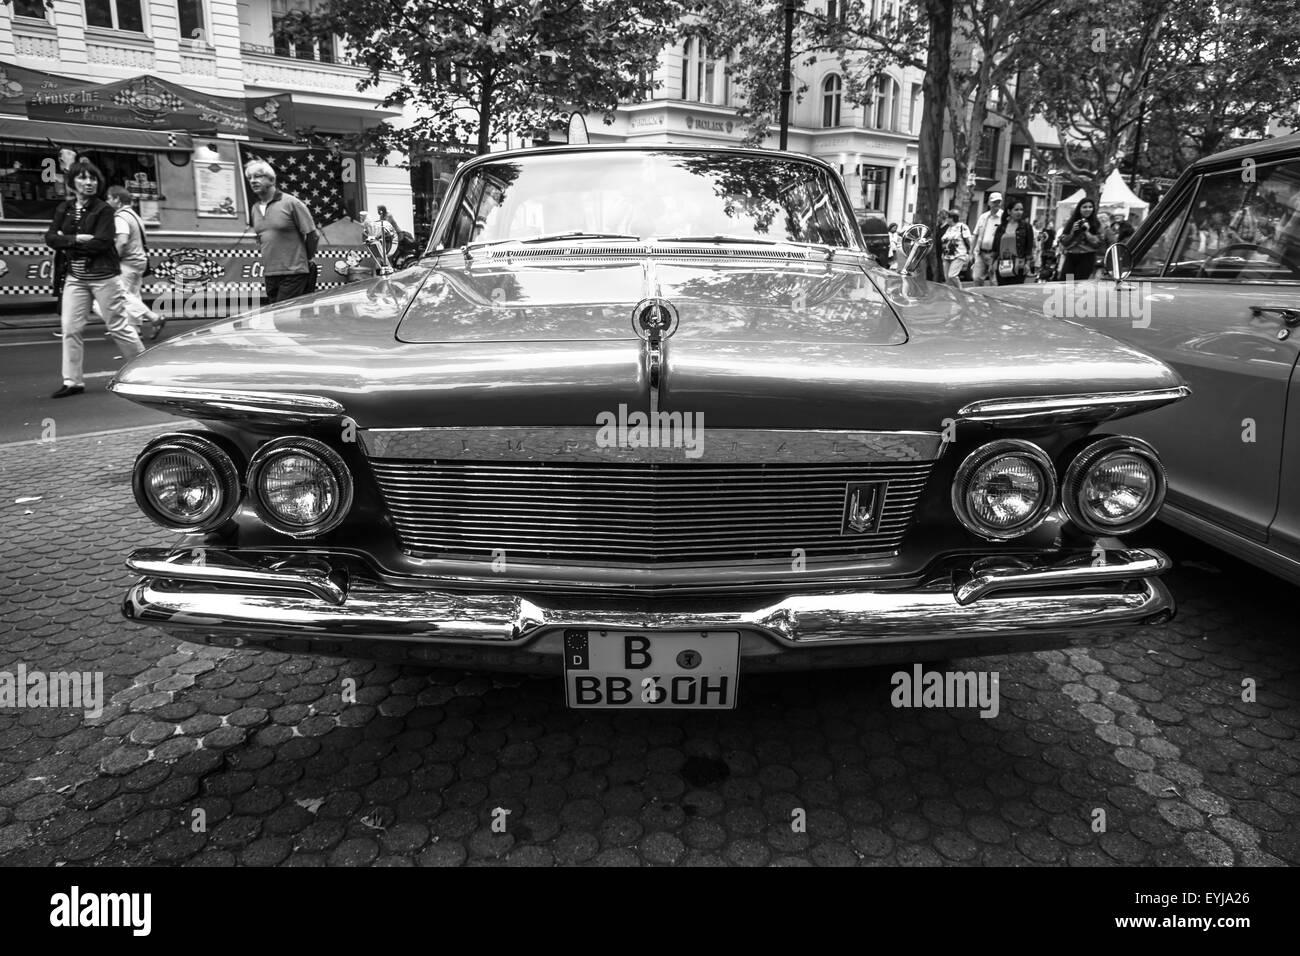 BERLIN - JUNE 14, 2015: Luxury car Imperial Custom 4-door Southampton, 1961. Black white. The Classic Days on Kurfuerstendamm. - Stock Image